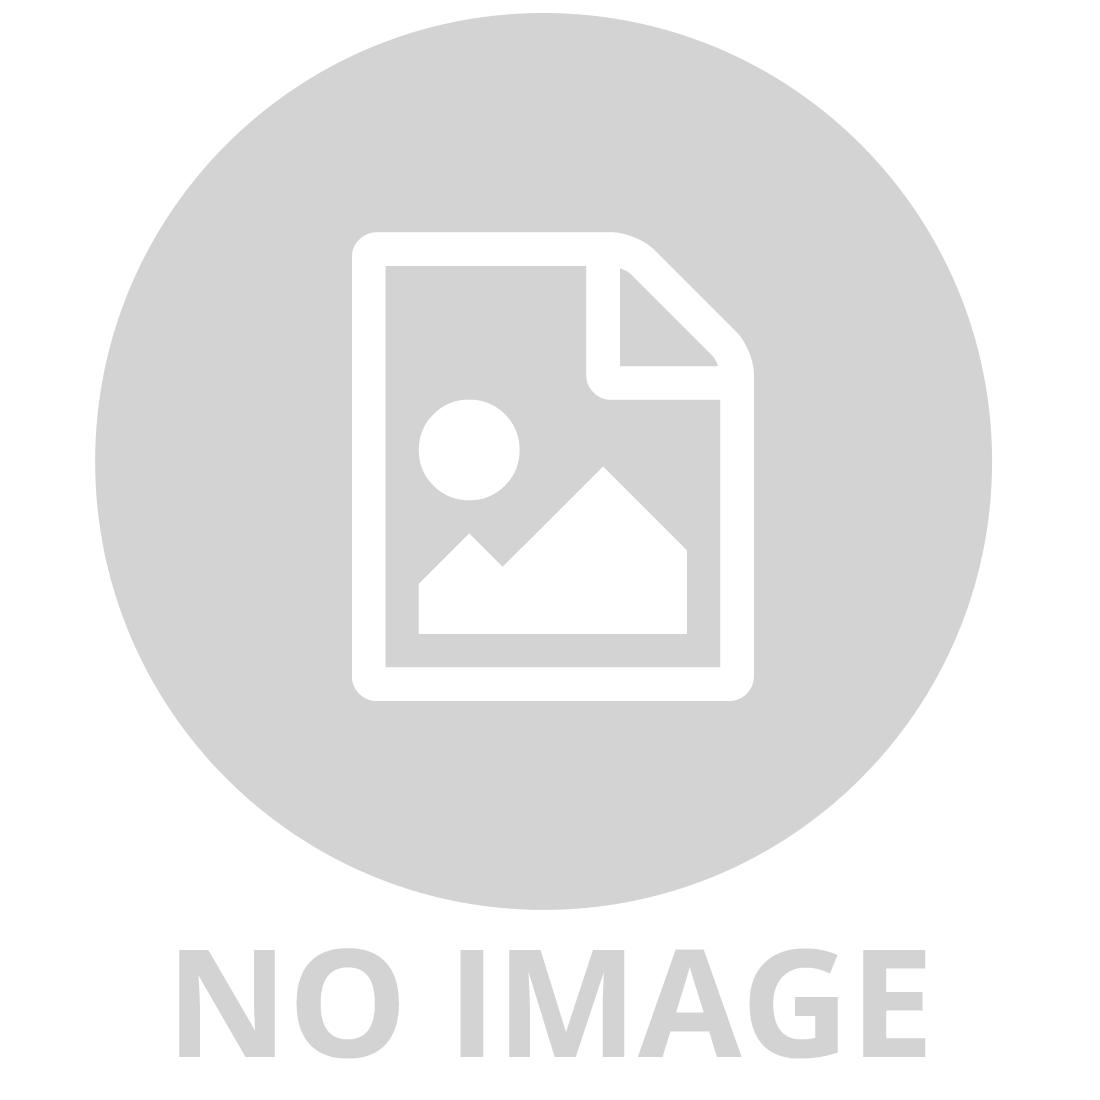 LEGO HARRY POTTER 75981 ADVENT CALENDAR